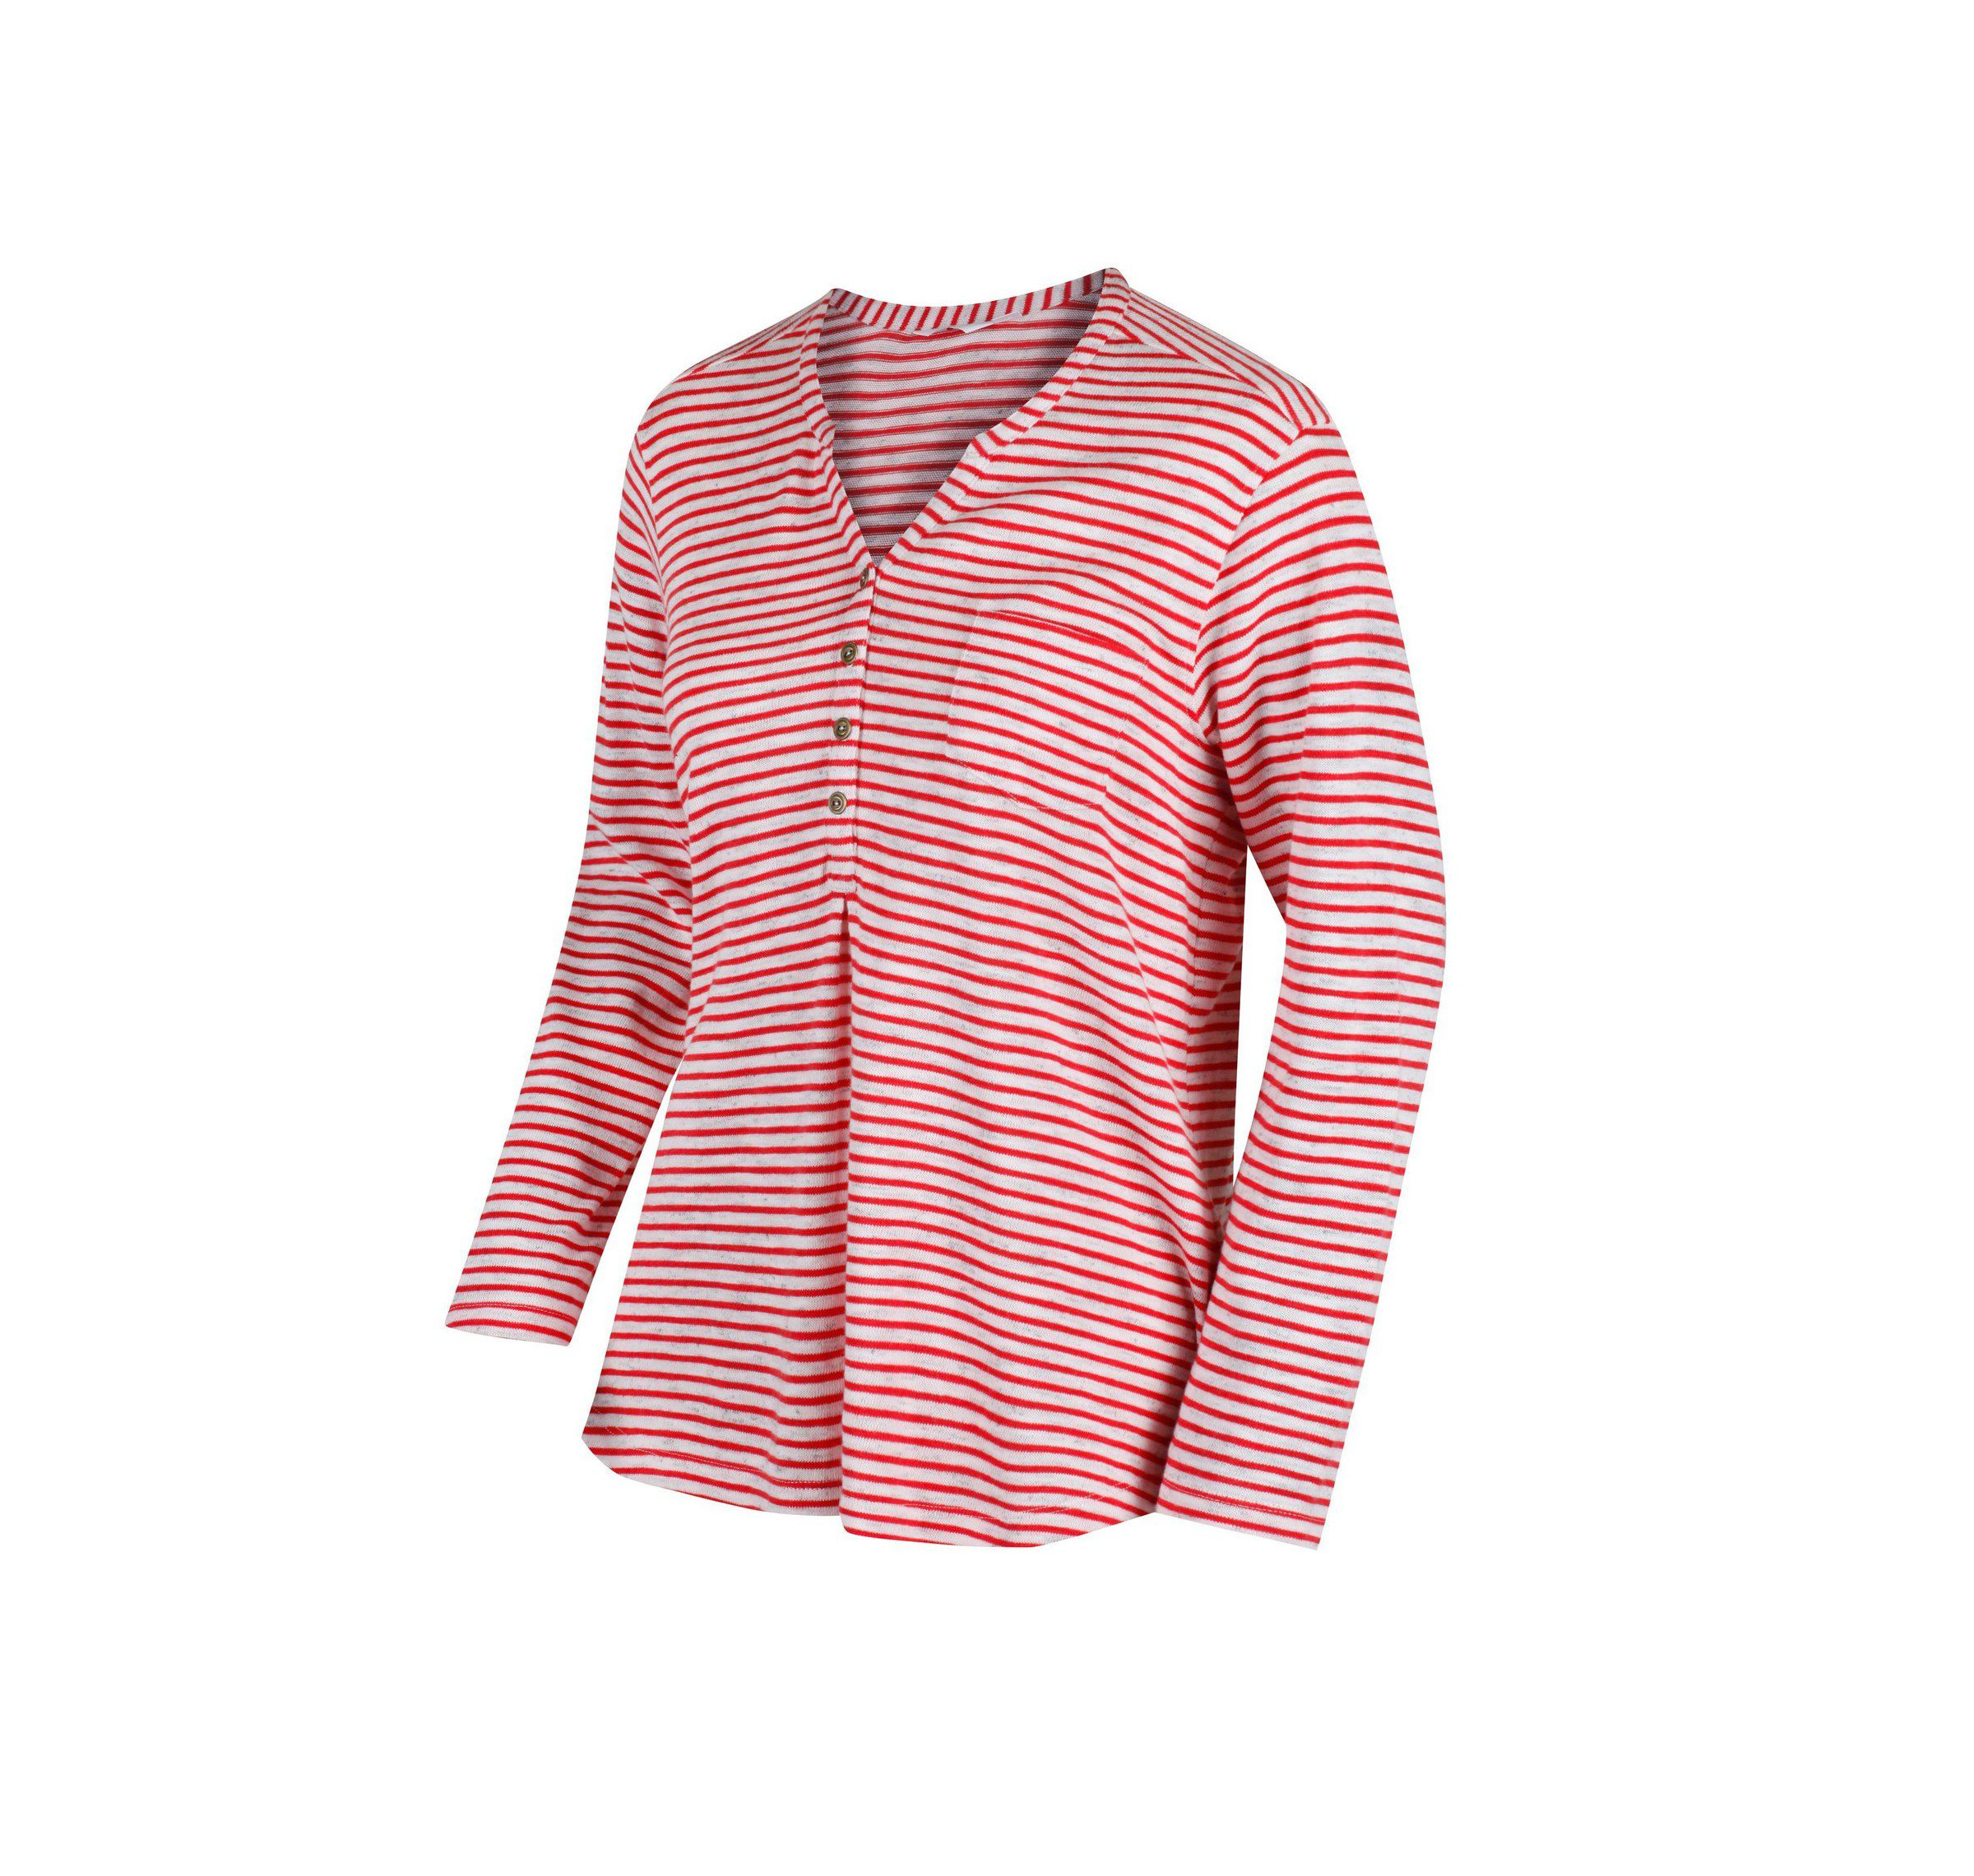 Regatta Women's Franzea Coolweave Cotton T-Shirt - Lollipop